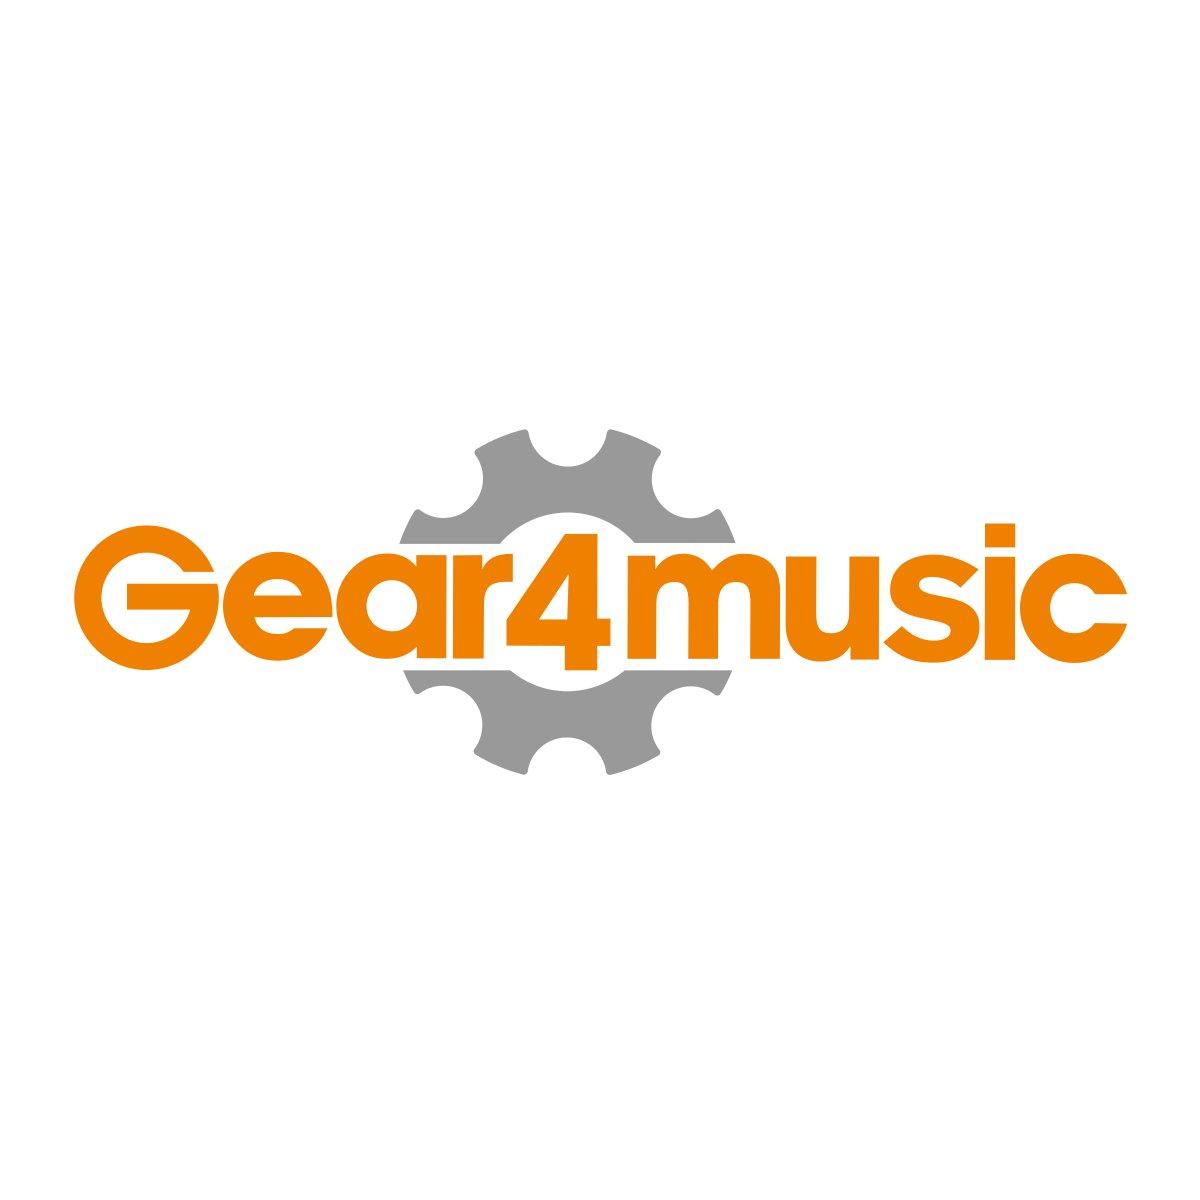 Funda Acolchada de Guitarra Acústica de 3/4 de Gear4music